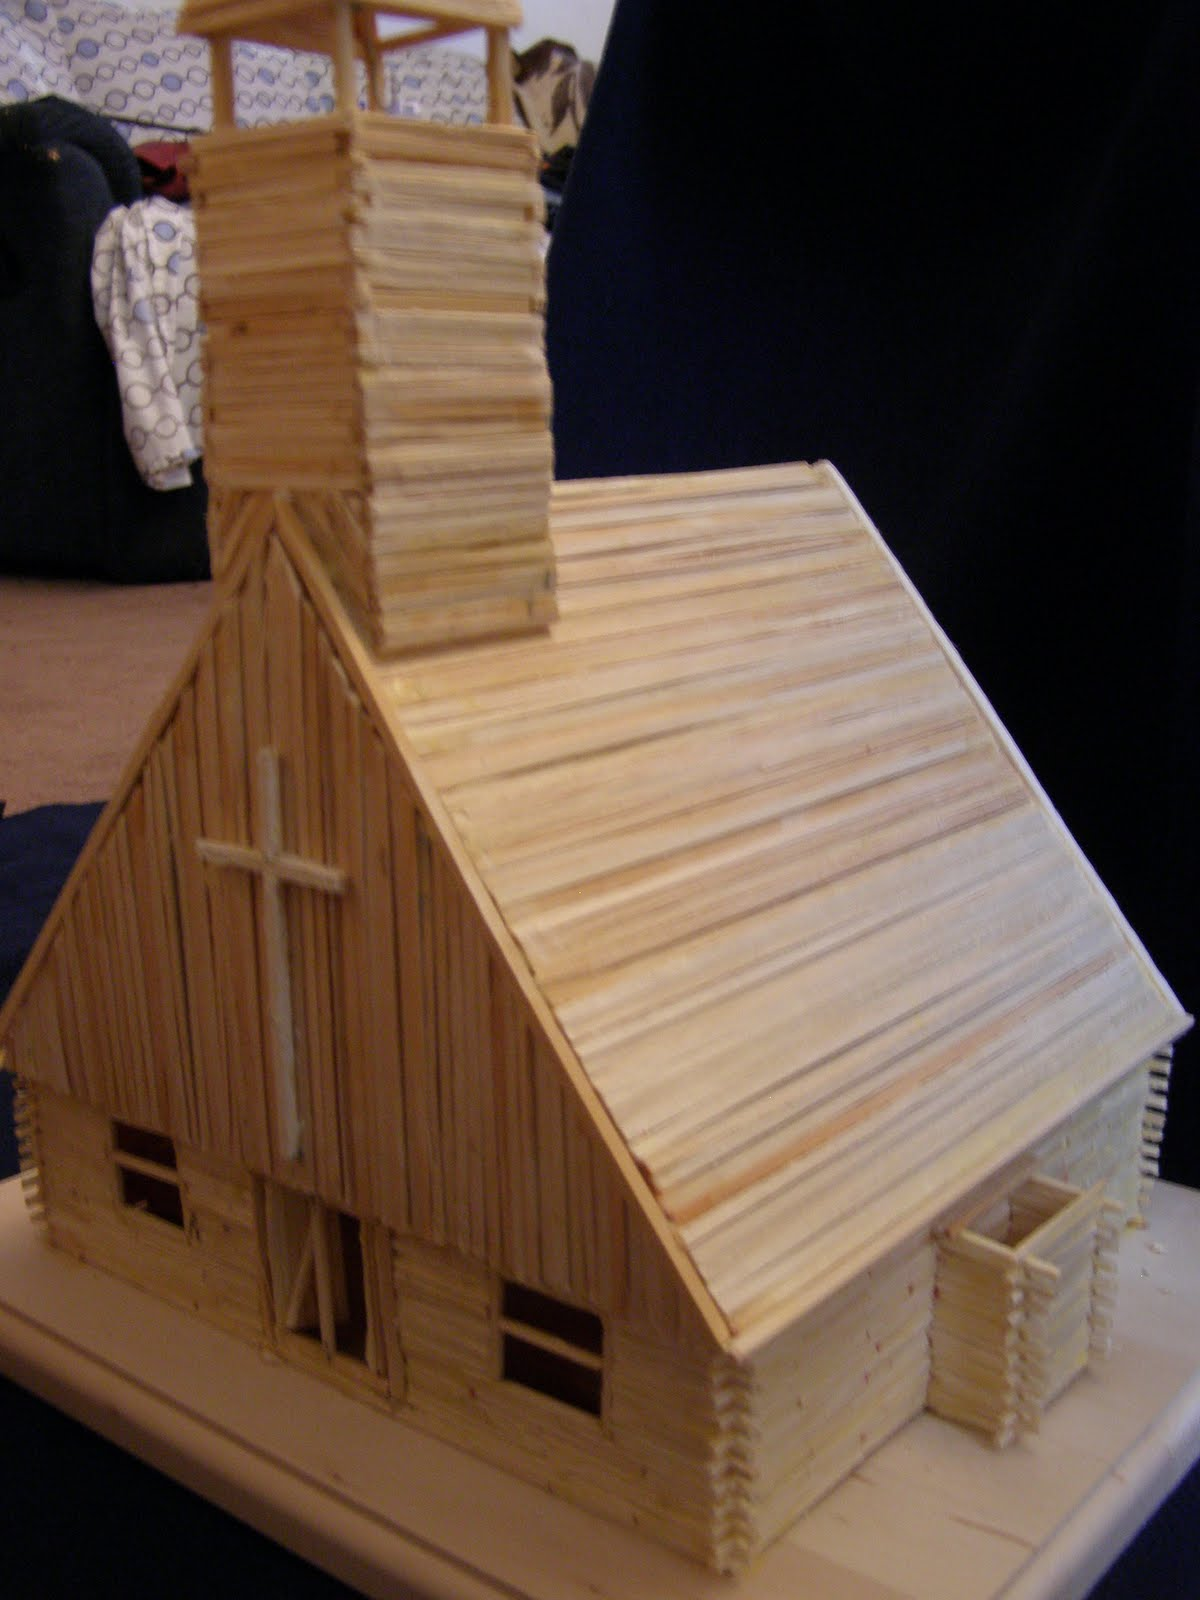 Miniature Log Cabins Main Page Miniature Log Cabins And